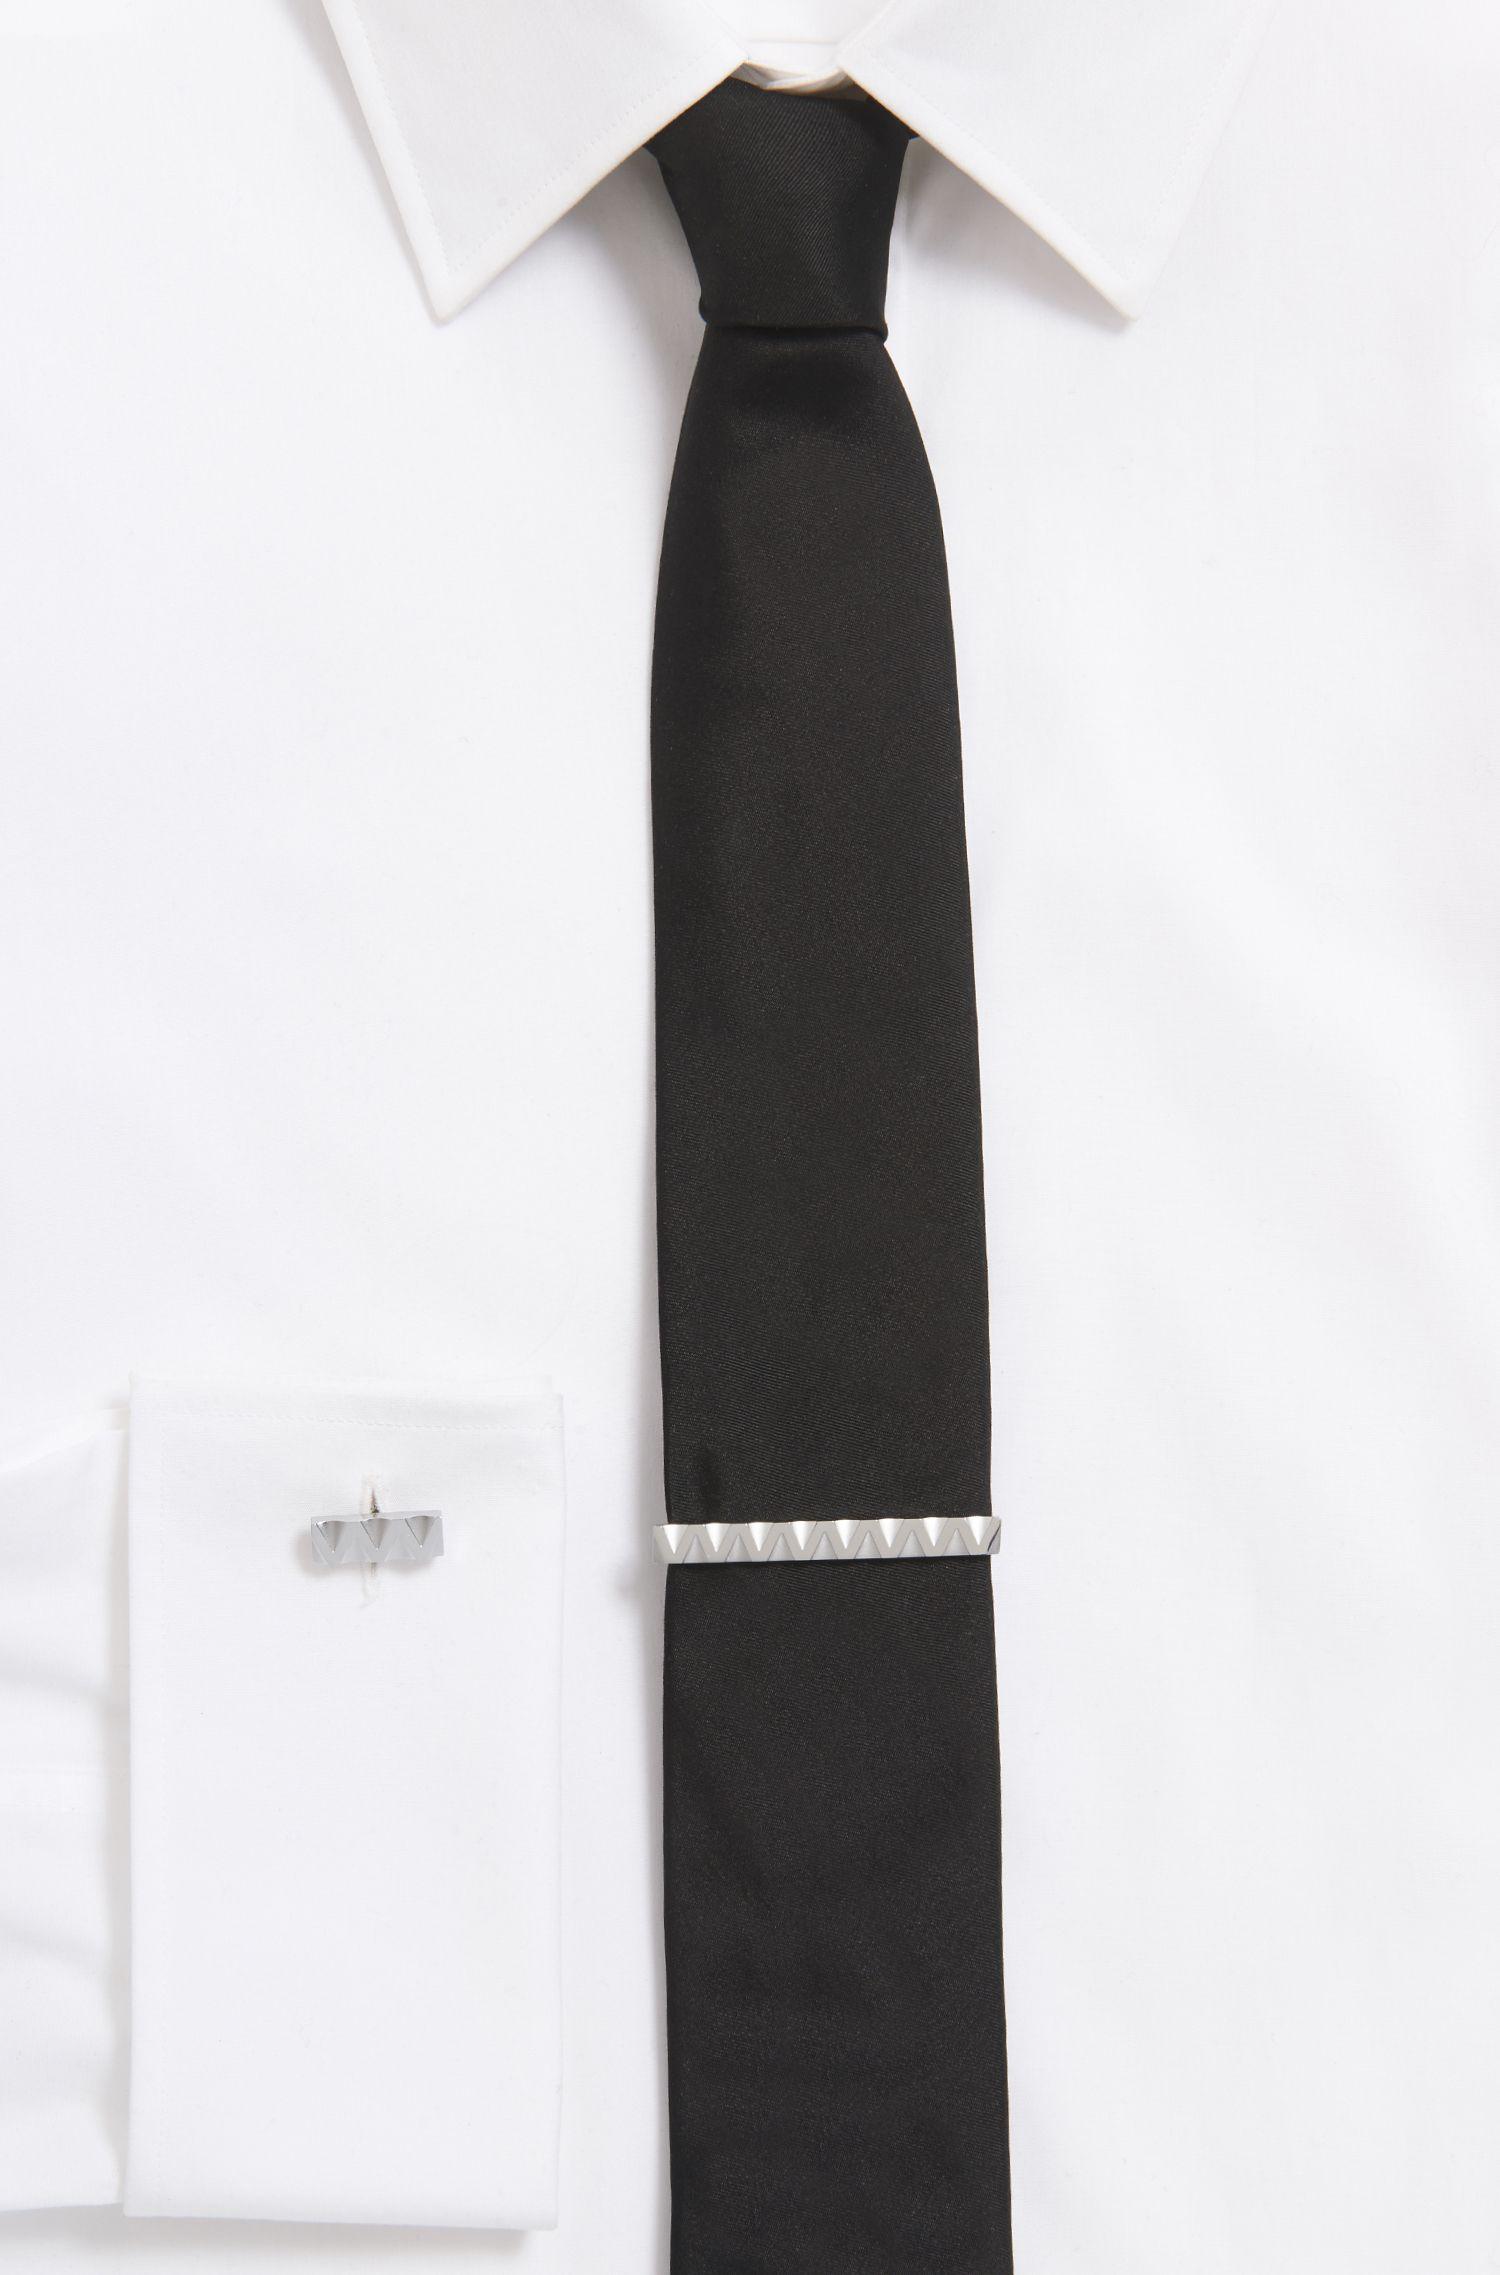 Krawattennadel aus Messing mit dreidimensionalem Zickzack-Design